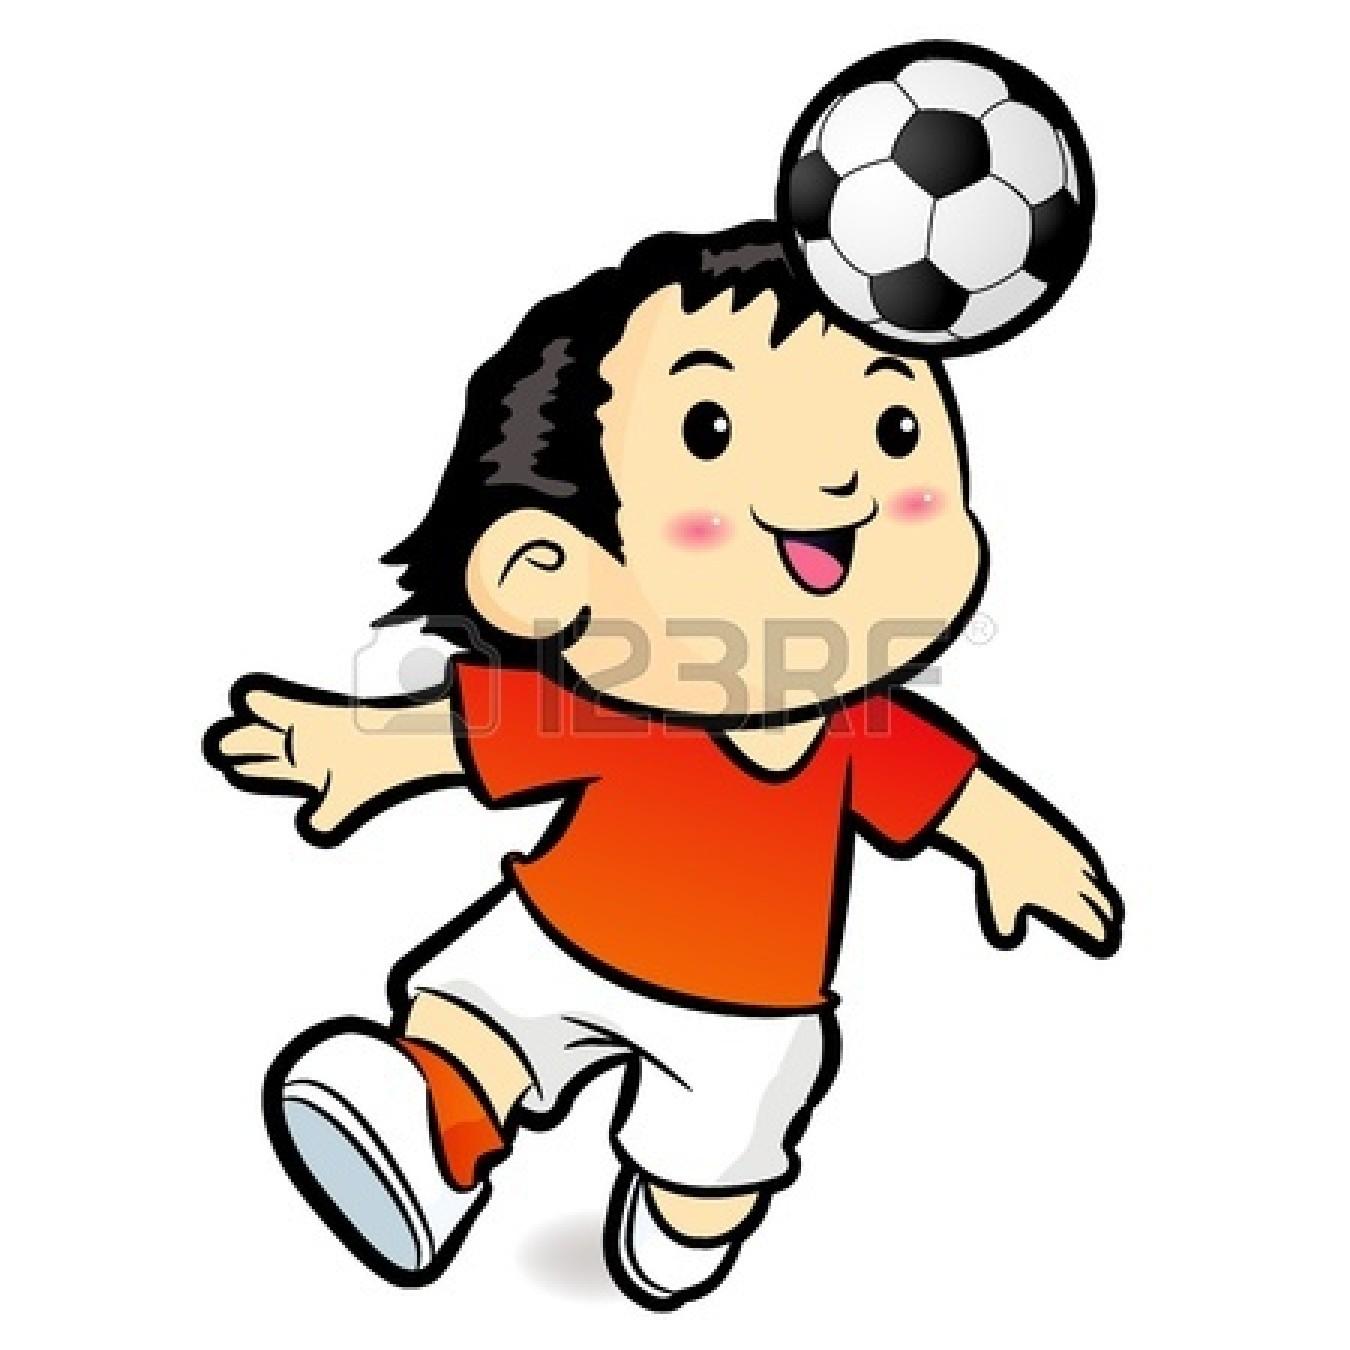 1350x1350 Soccer Player Images Clip Art 5275248